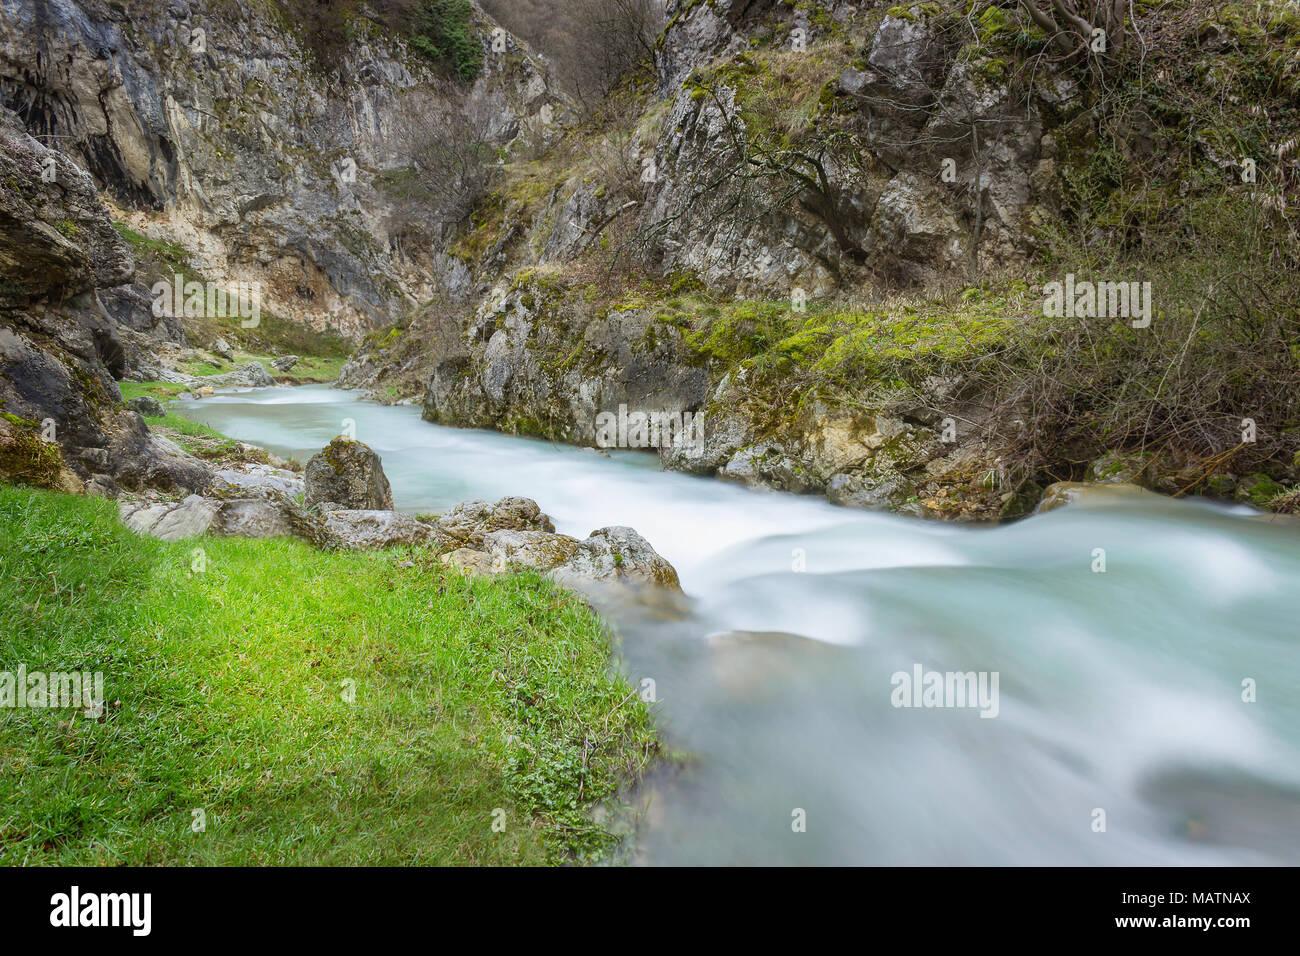 Cold Creek Canyon